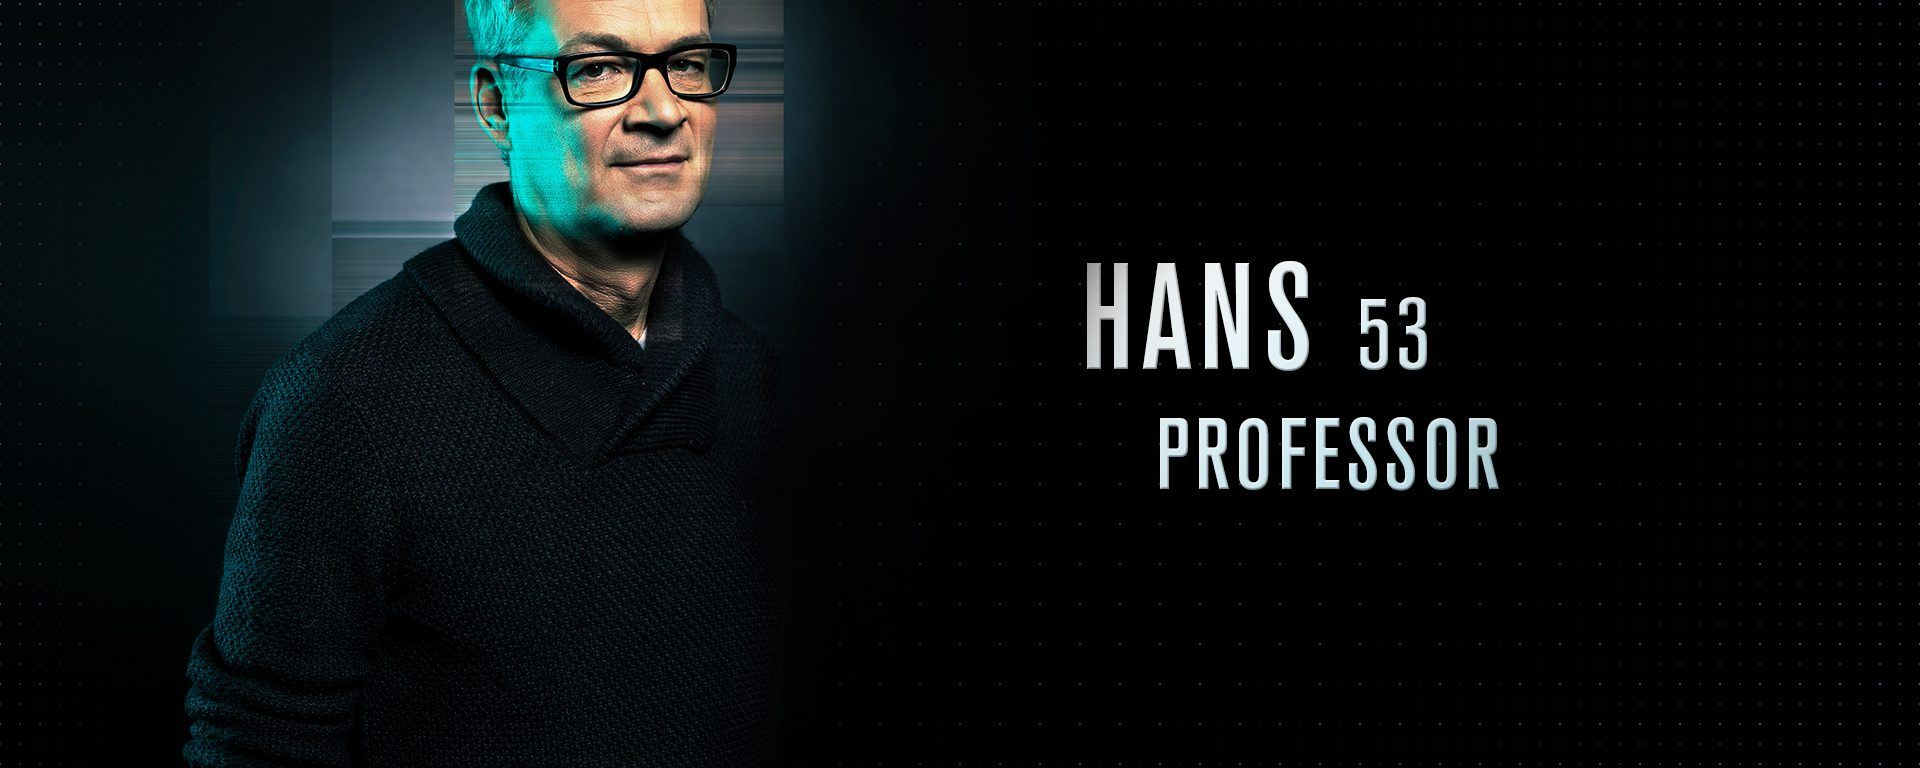 HANS-met-tekst